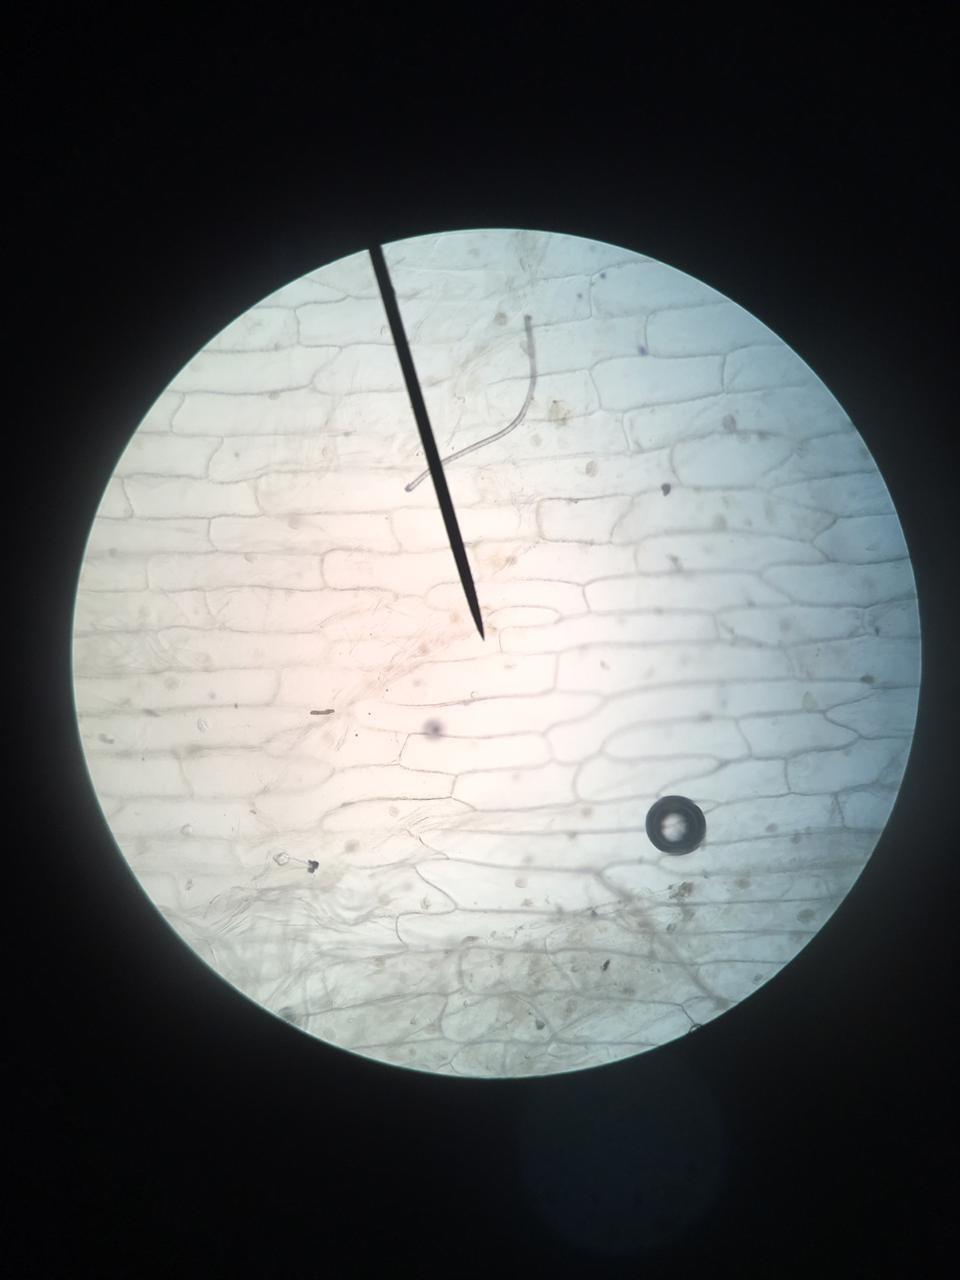 Mengapa Mikroskop Merupakan Sesuatu Yang Sangat Berguna Untuk Mempelajari Sel : mengapa, mikroskop, merupakan, sesuatu, sangat, berguna, untuk, mempelajari, Megapa, Mikroskop, Merupakan, Sesuatu, Sangat, Berguna, Untuk, Mempelajari, Sel?jelaskan, Brainly.co.id